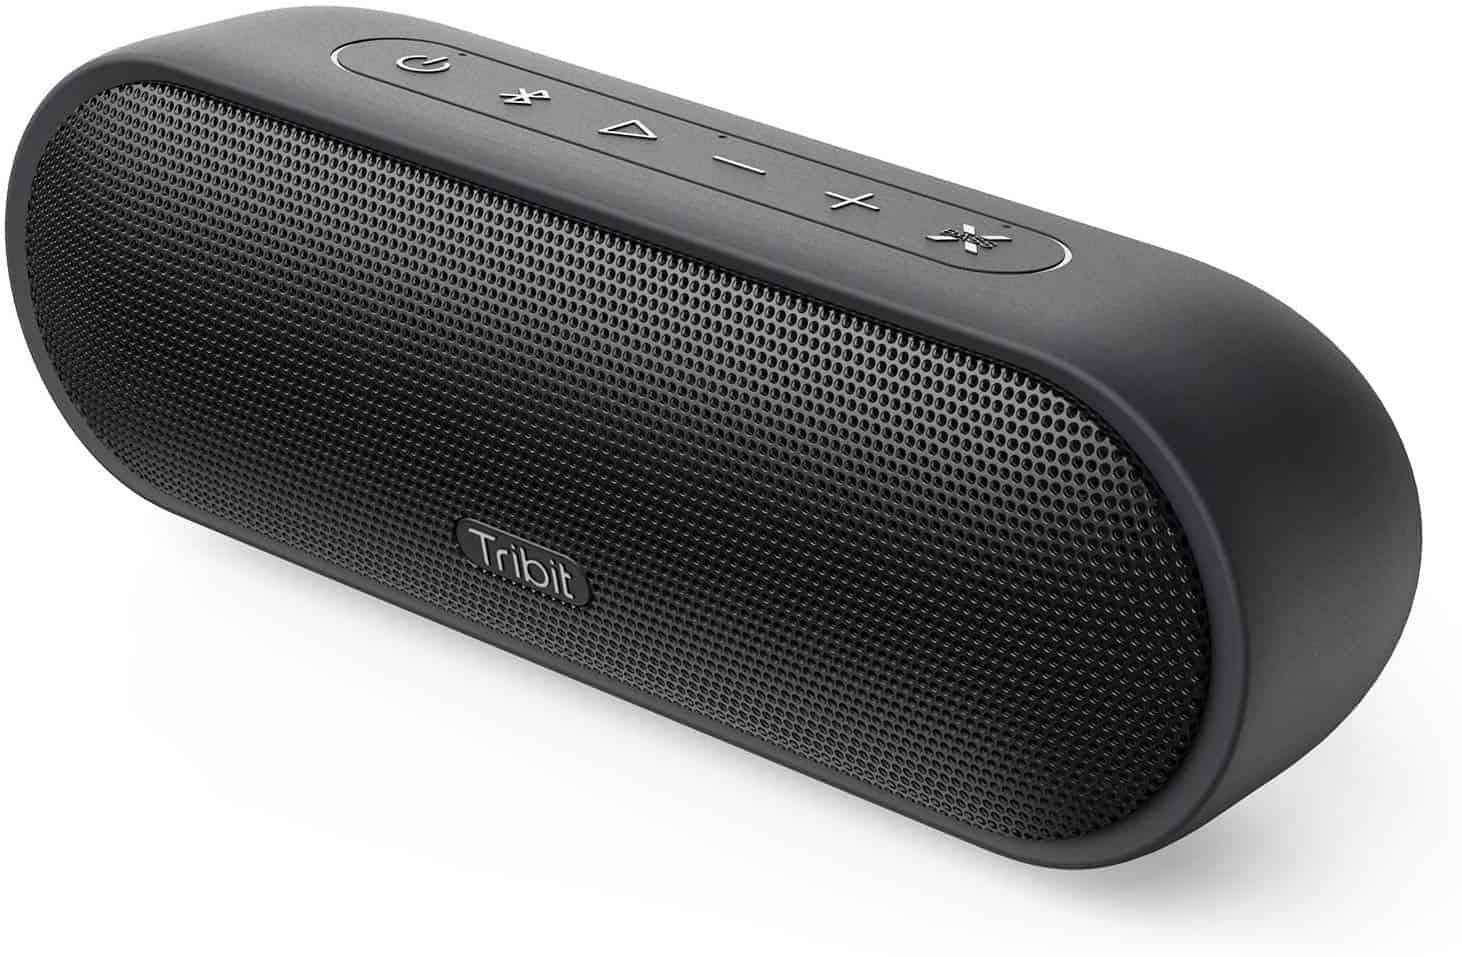 Tribit MaxSound Plus Portable Bluetooth Speaker - Amazon